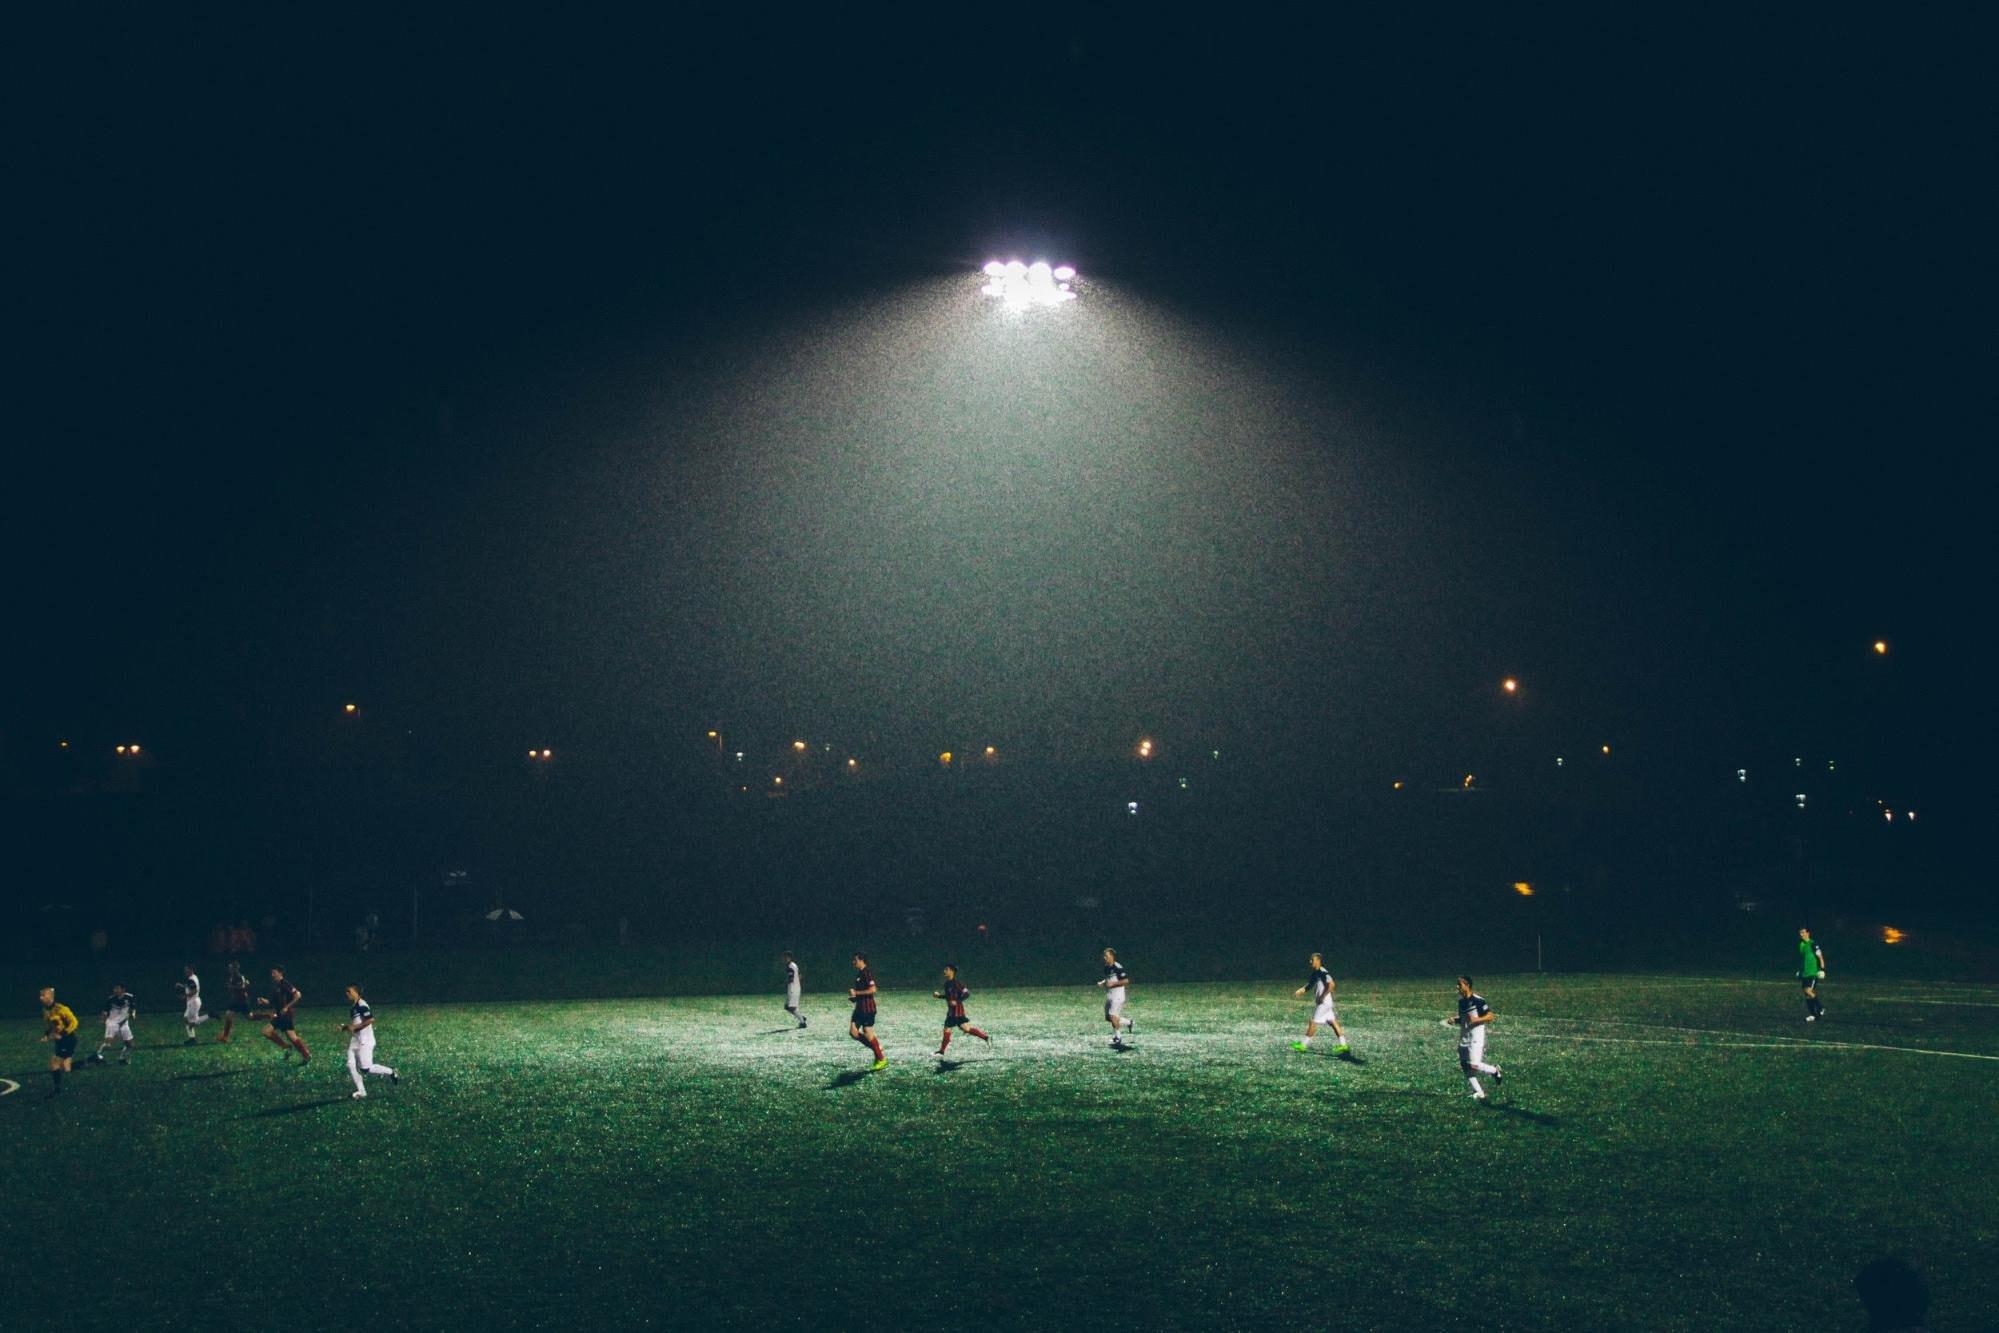 sports-photography-abigail-keenan